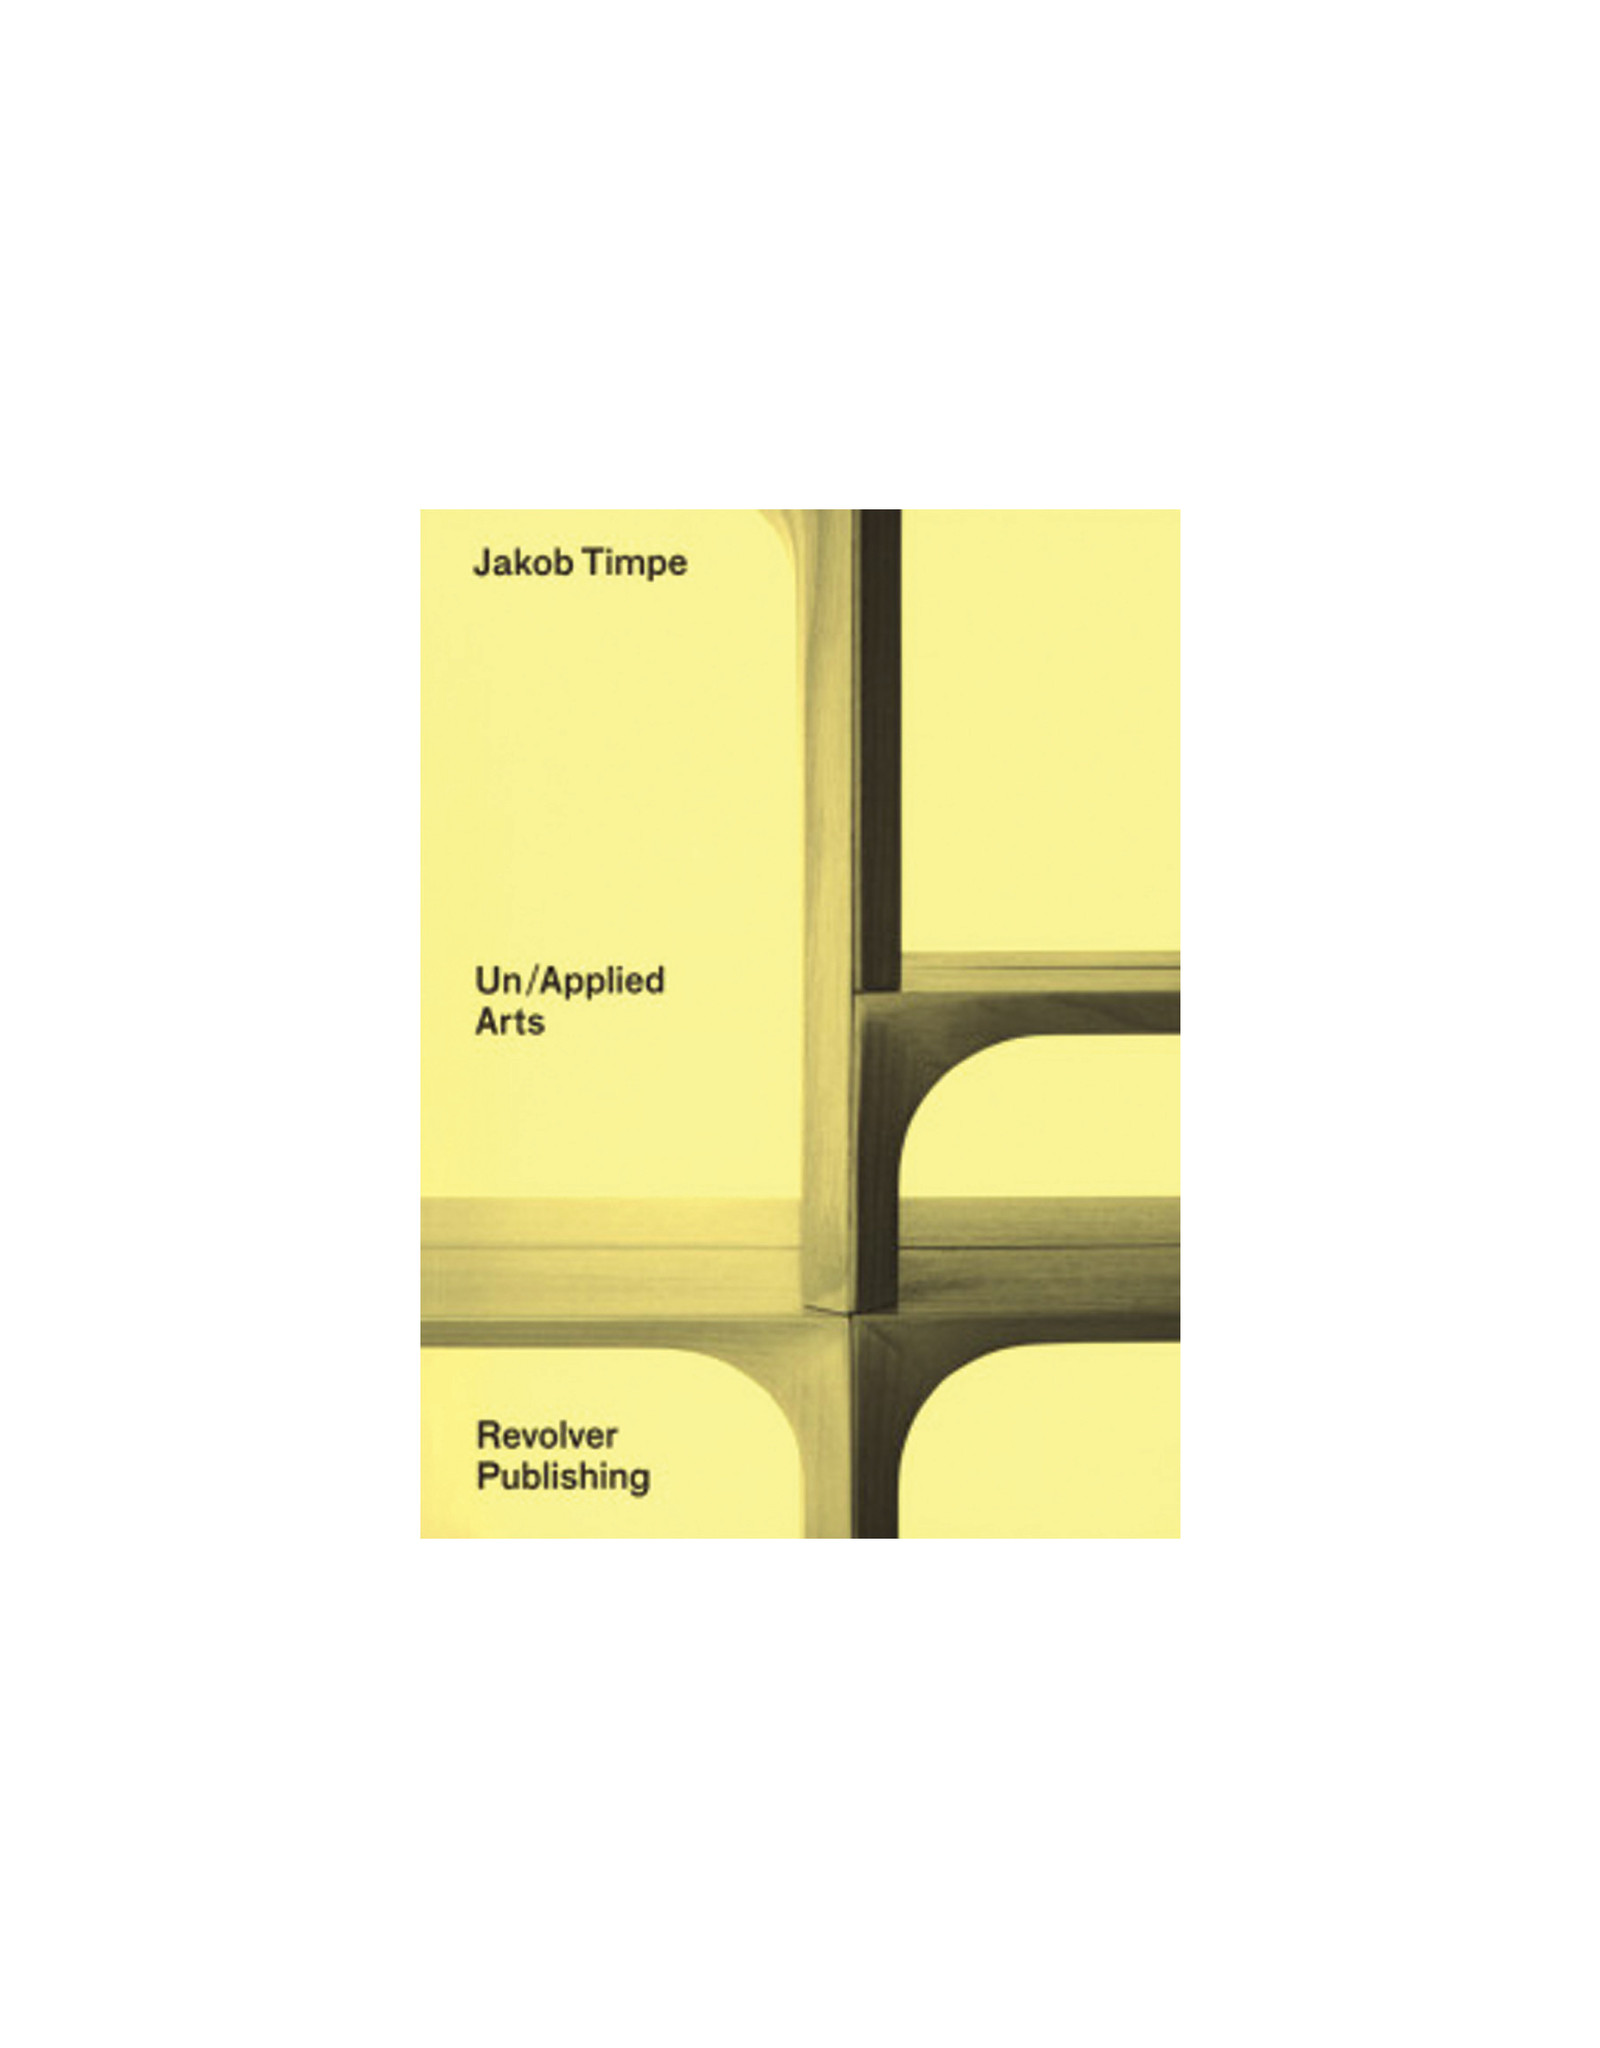 Jakob Timpe - Un/Applied Arts